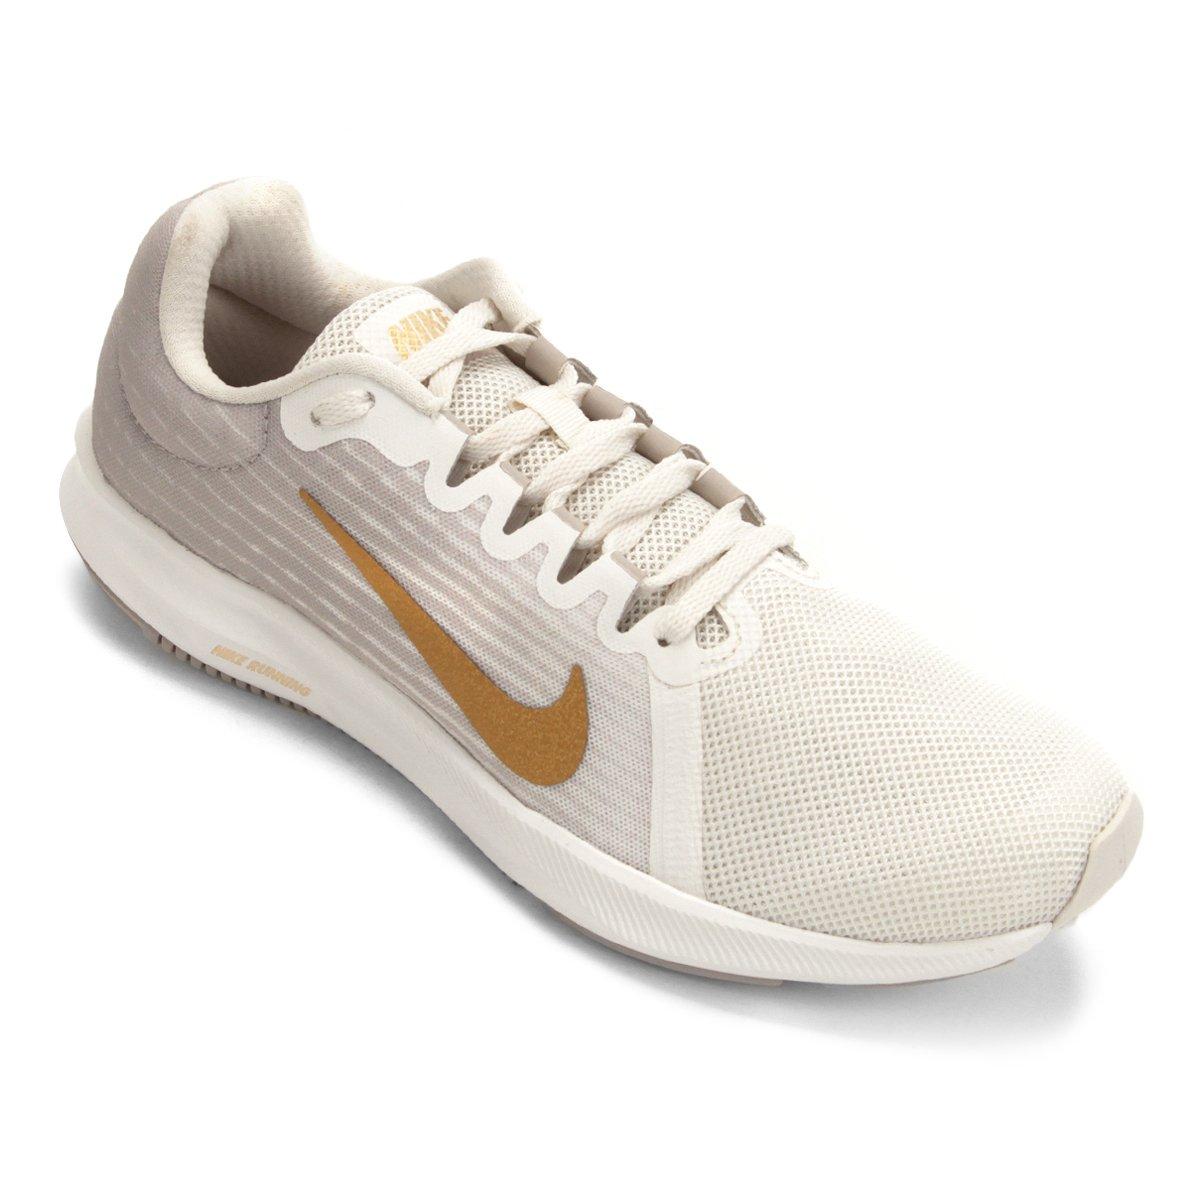 Tênis Nike Wmns Downshifter 8 Feminino Cinza E Dourado